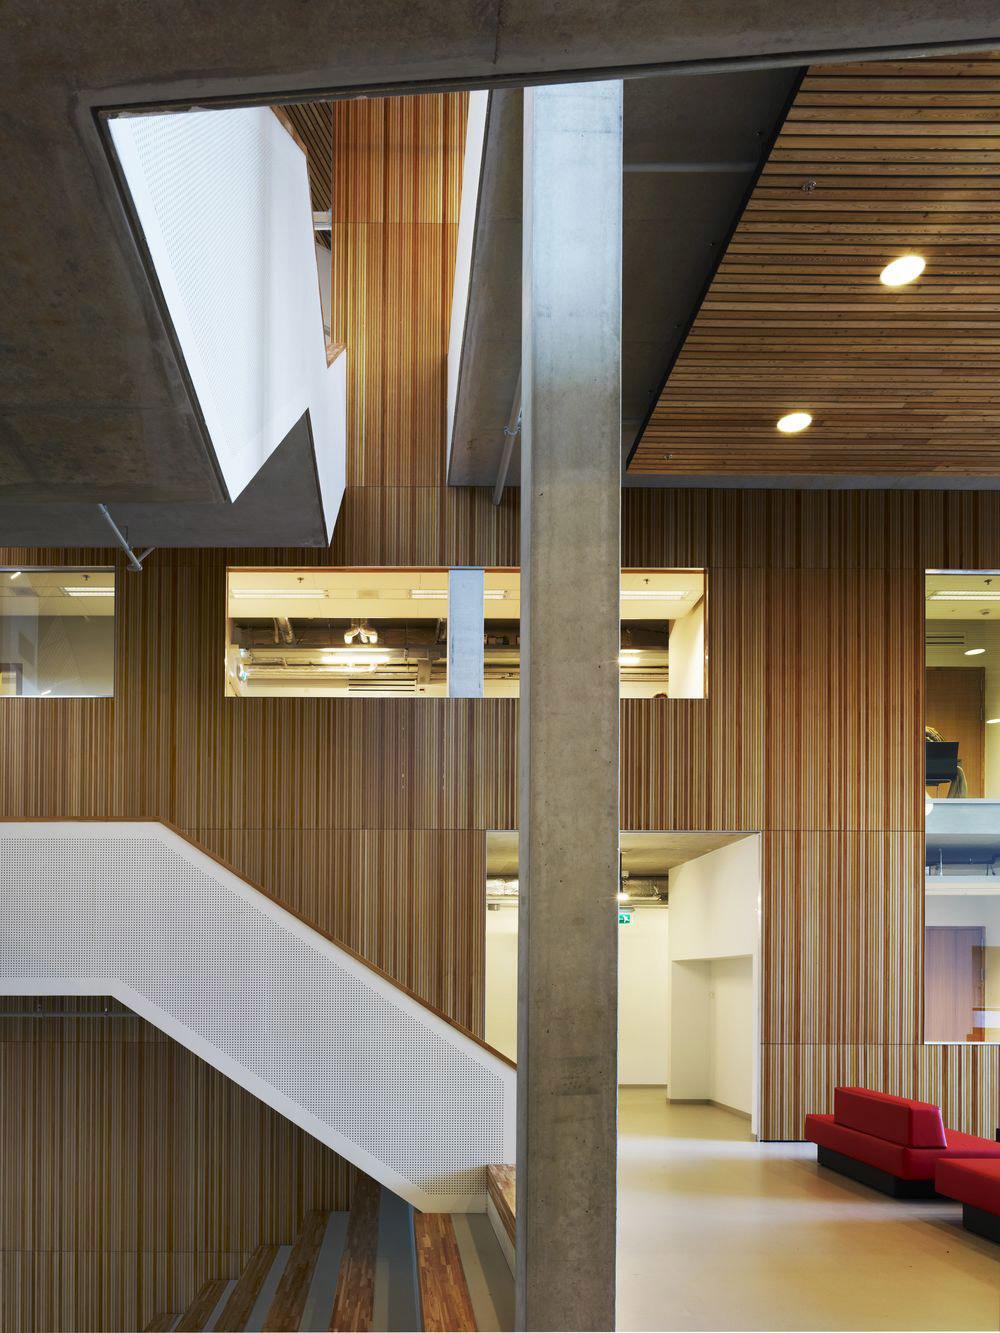 Winding staircase (Image: Mecanoo architecten)